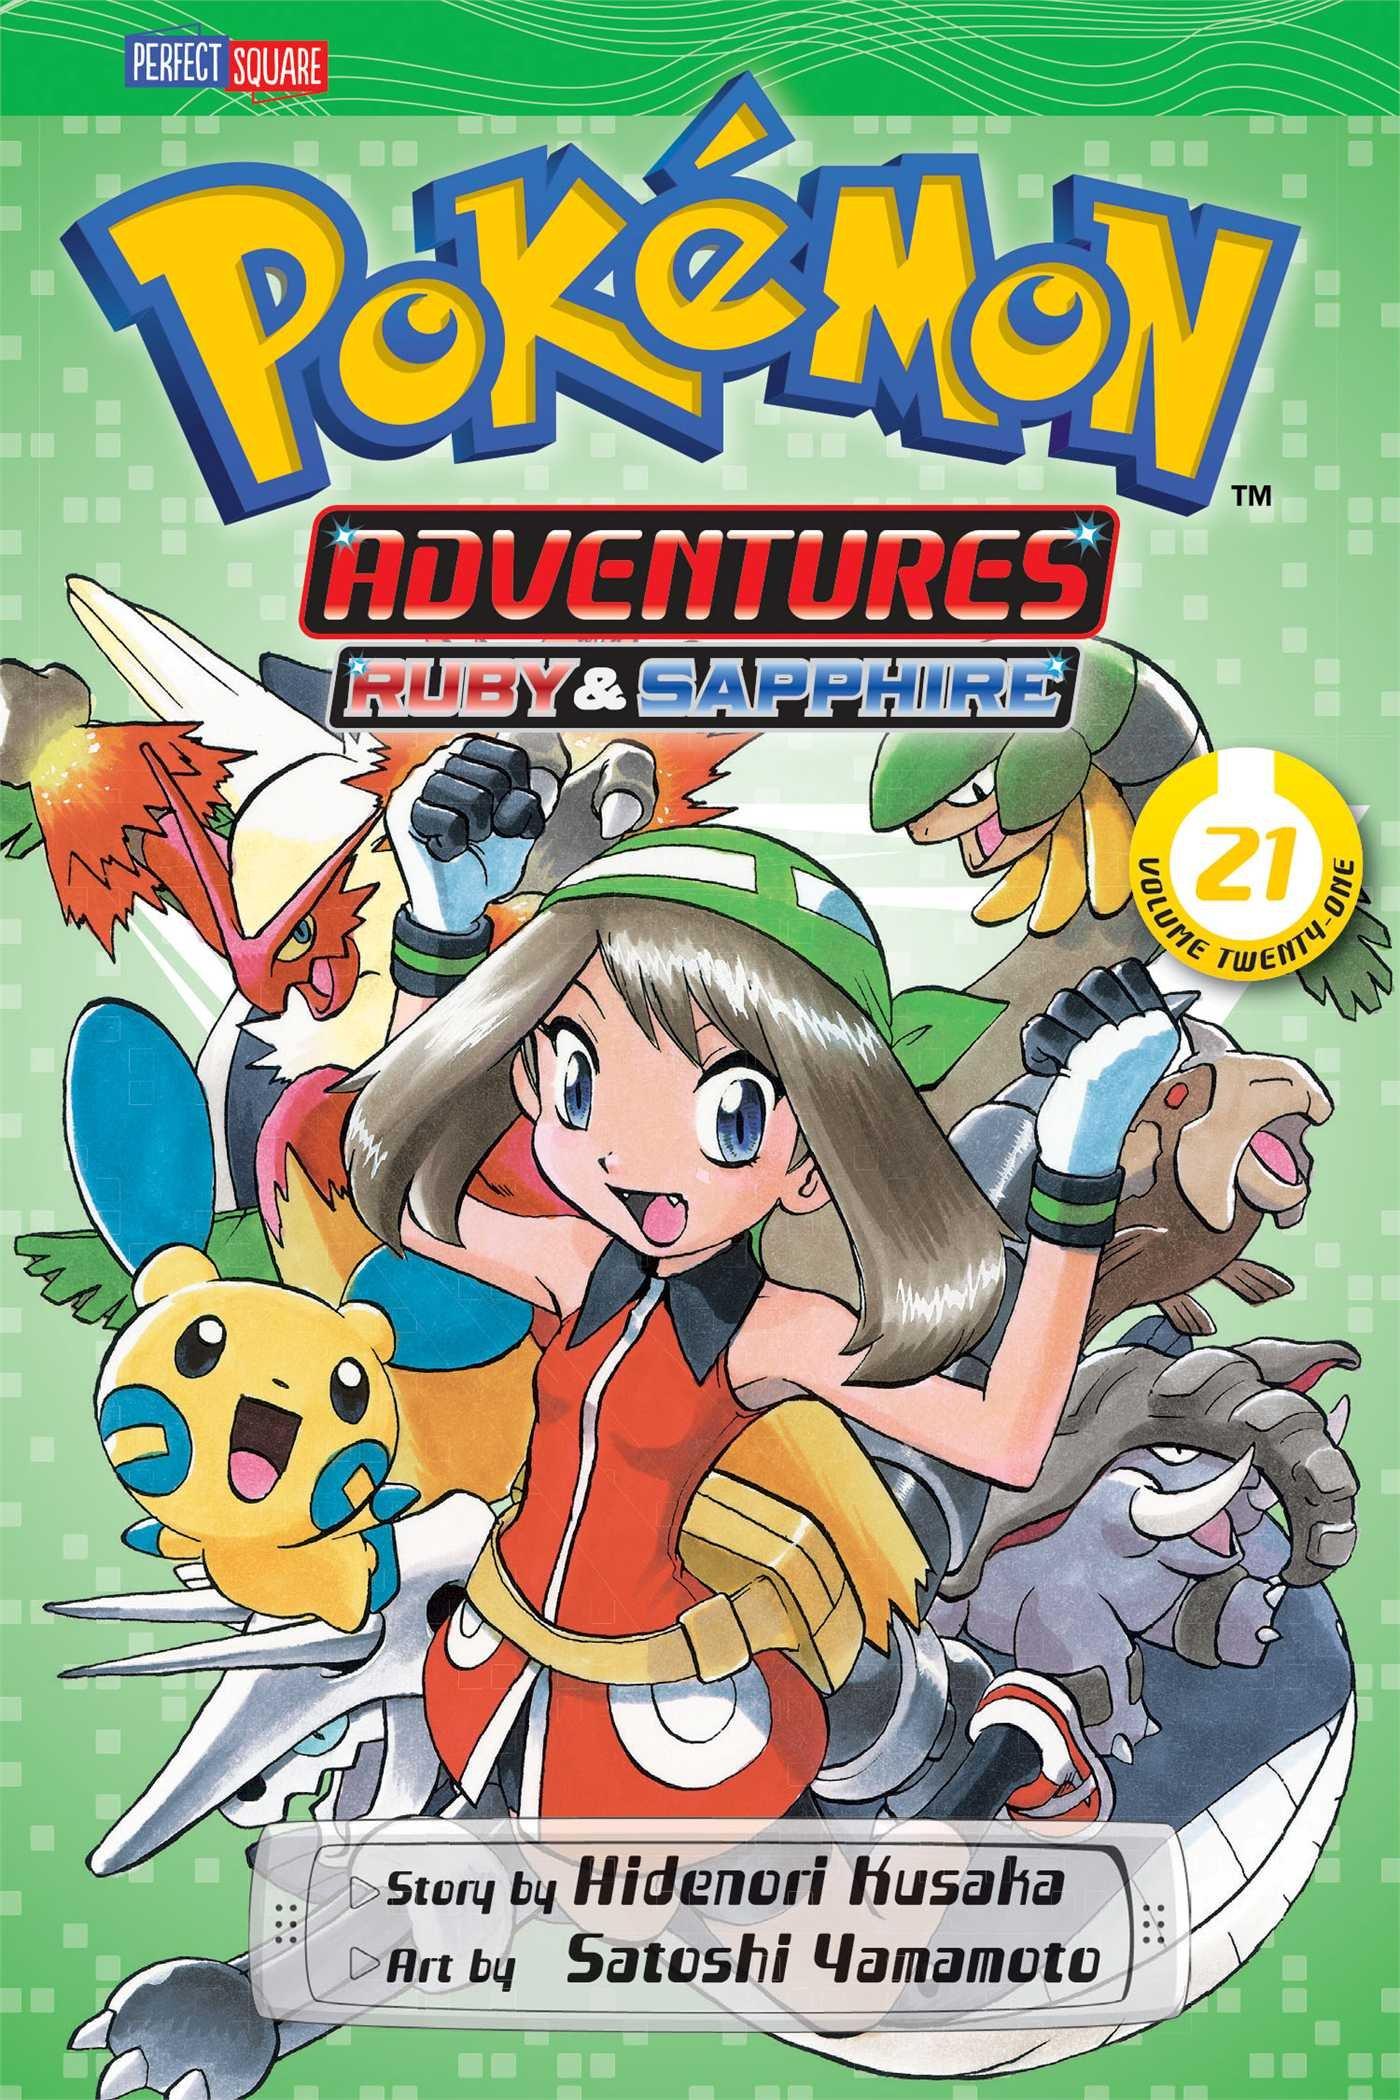 Pok%C3%A9mon Adventures Vol 21 Pokemon product image